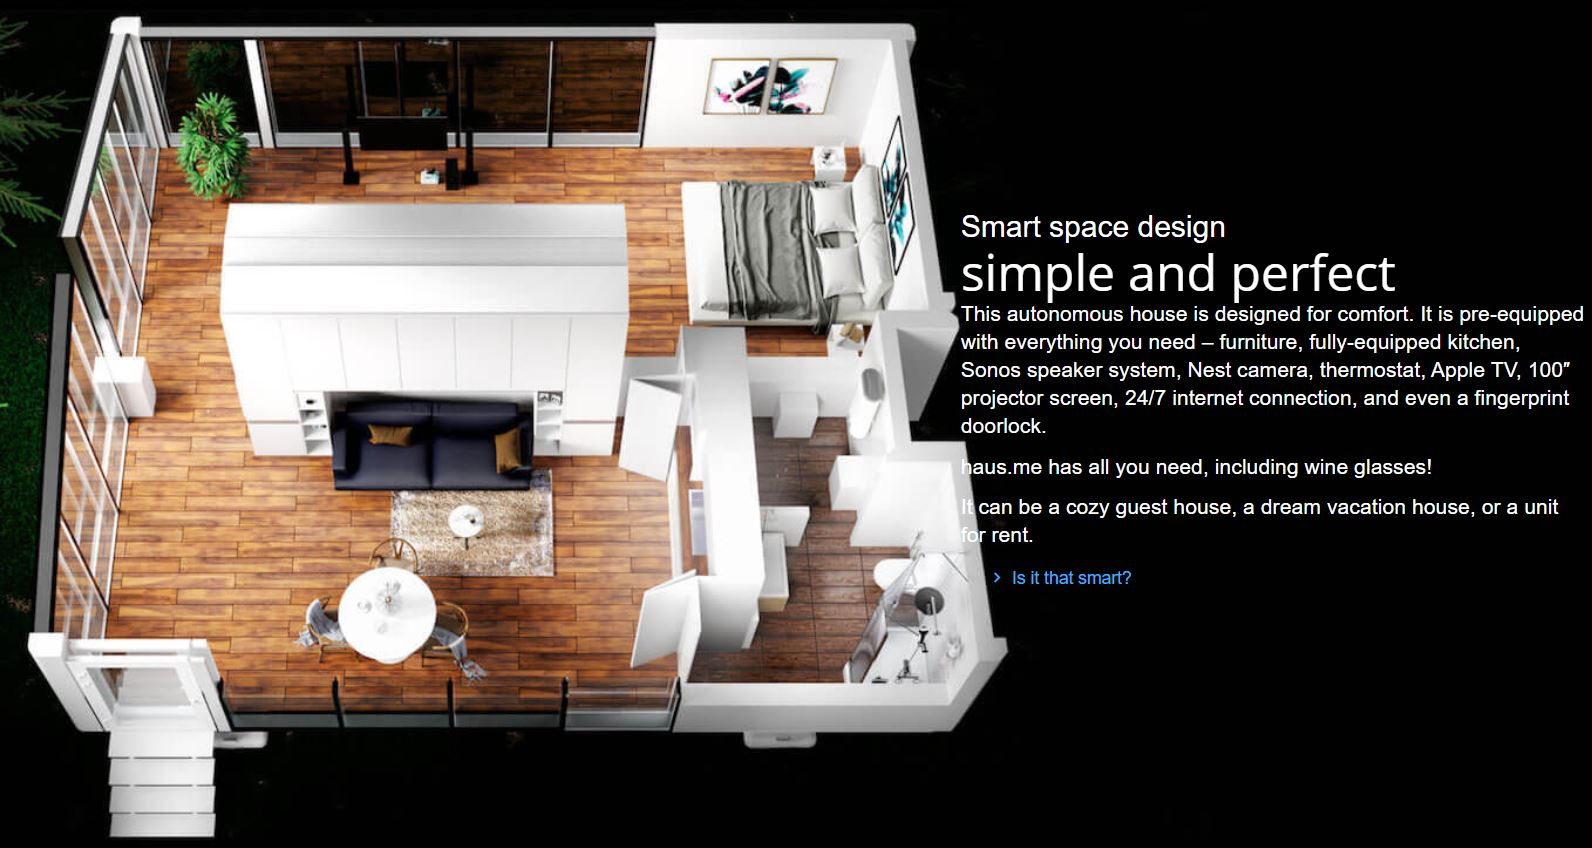 Autonomous off the grid smart houses from Haus.me